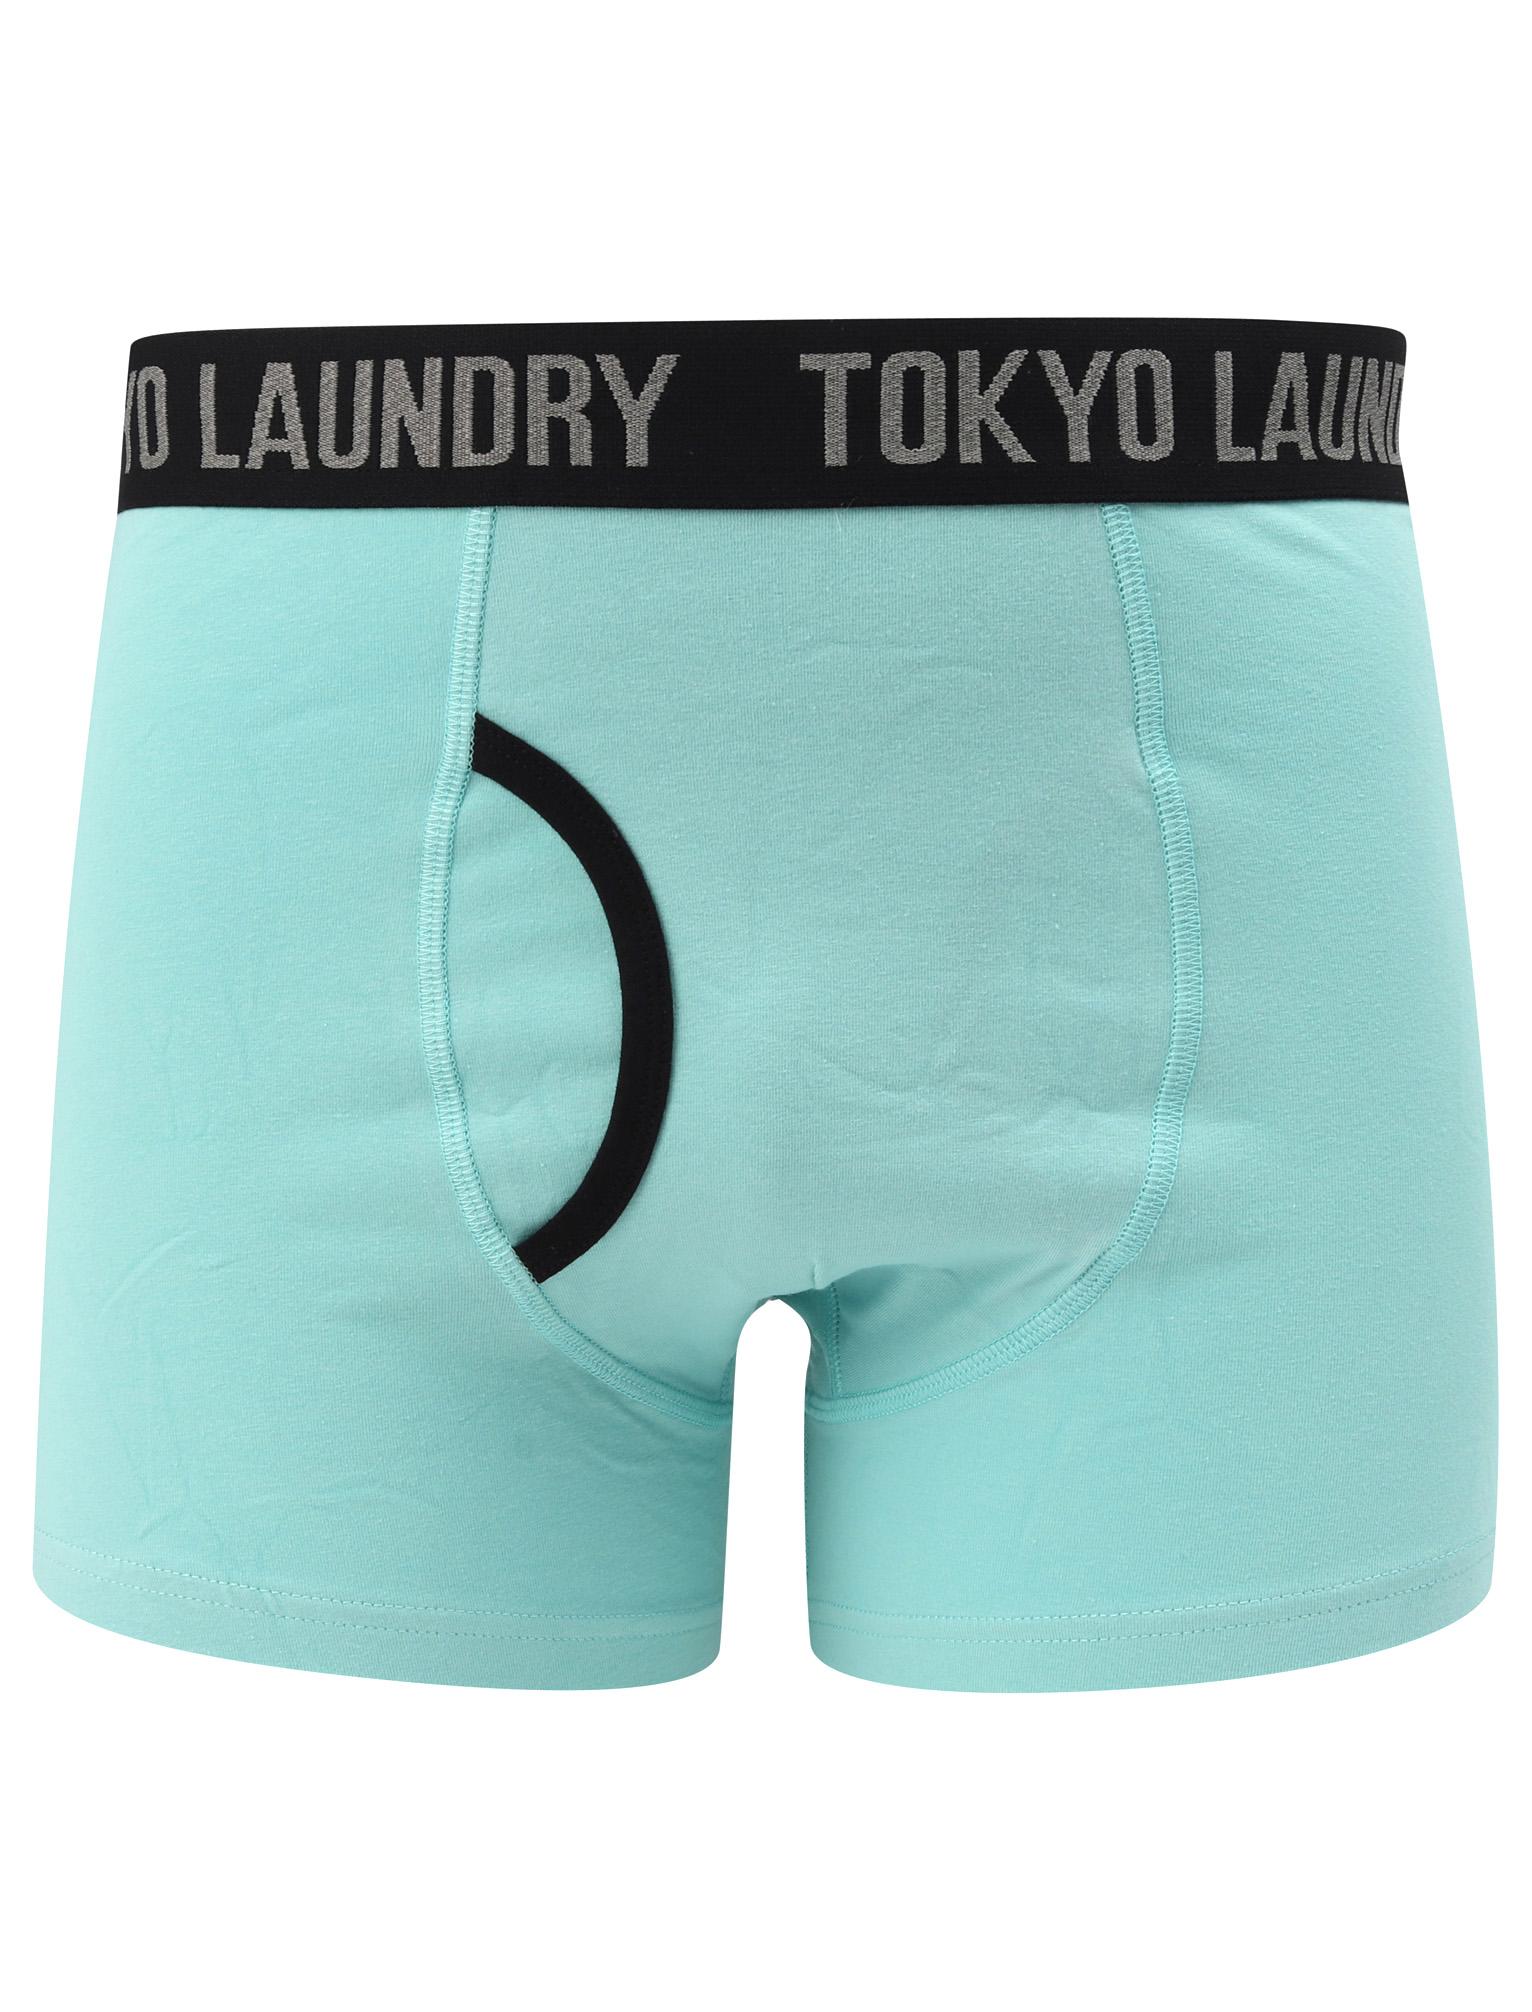 New-Mens-Tokyo-Laundry-2-Pack-Cotton-Rich-Boxer-Shorts-Set-Trunks-Size-S-XXL thumbnail 70